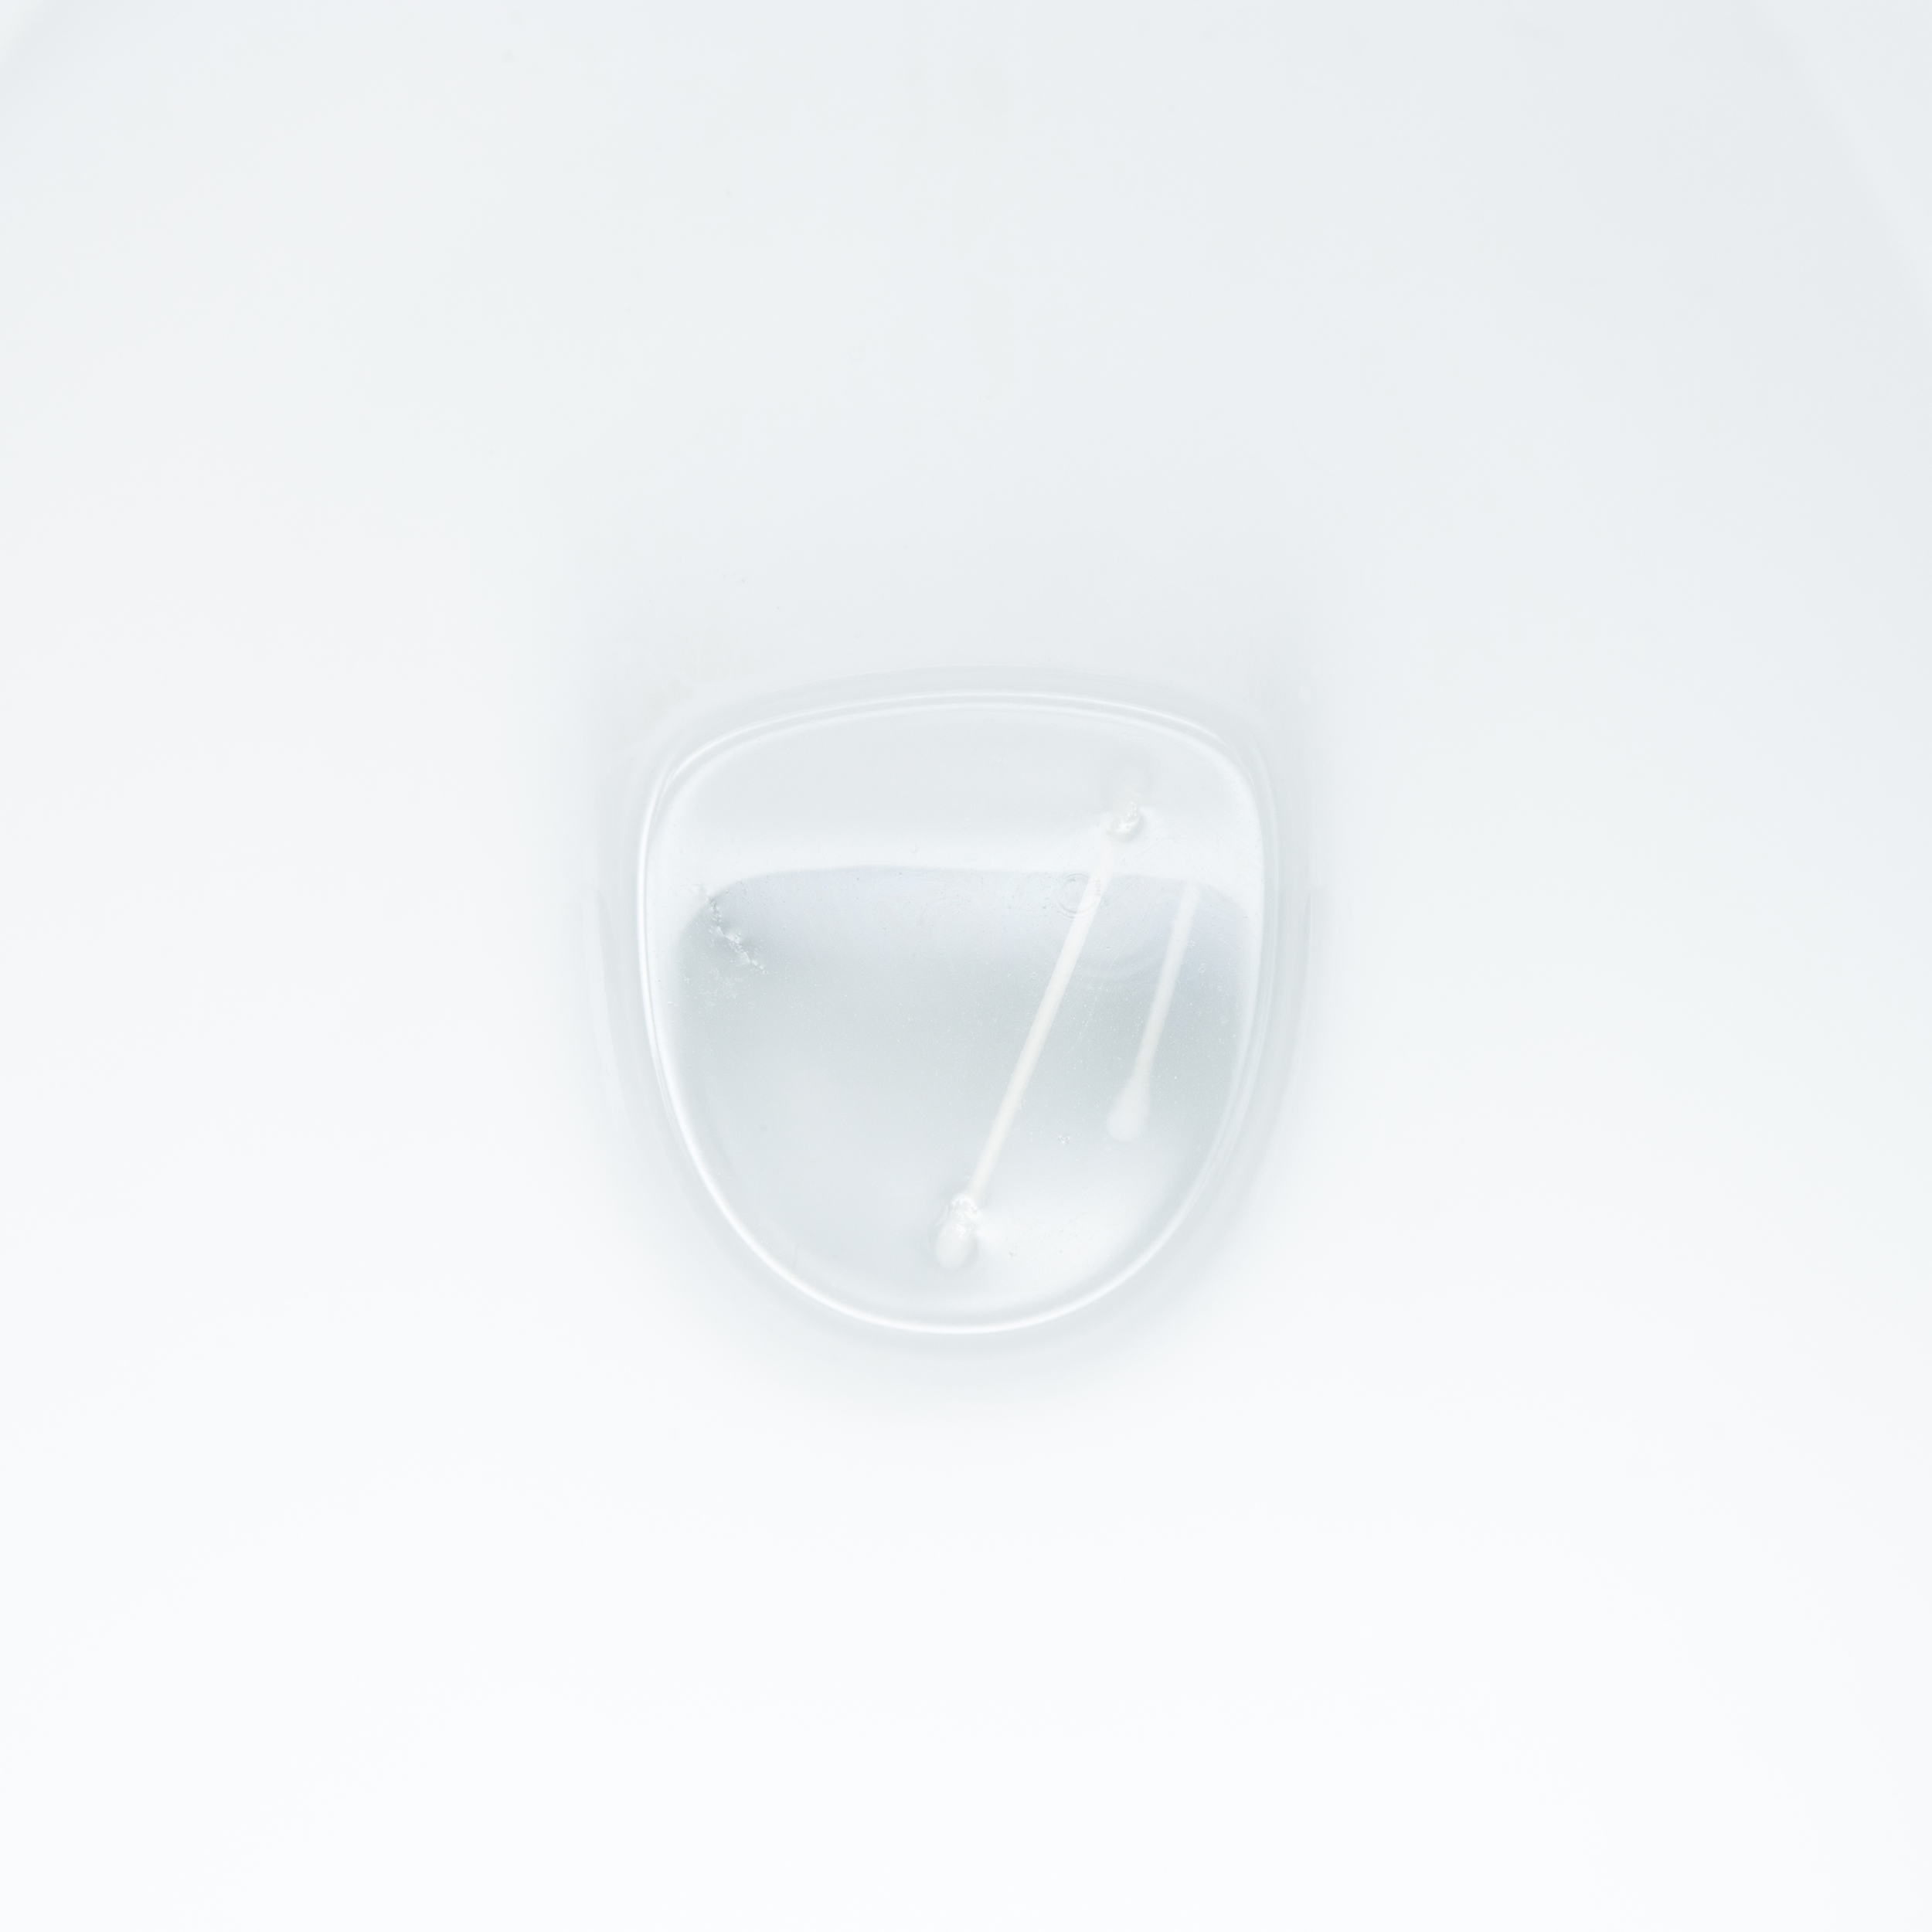 el agujero blanco5-1982_feb2016.jpg